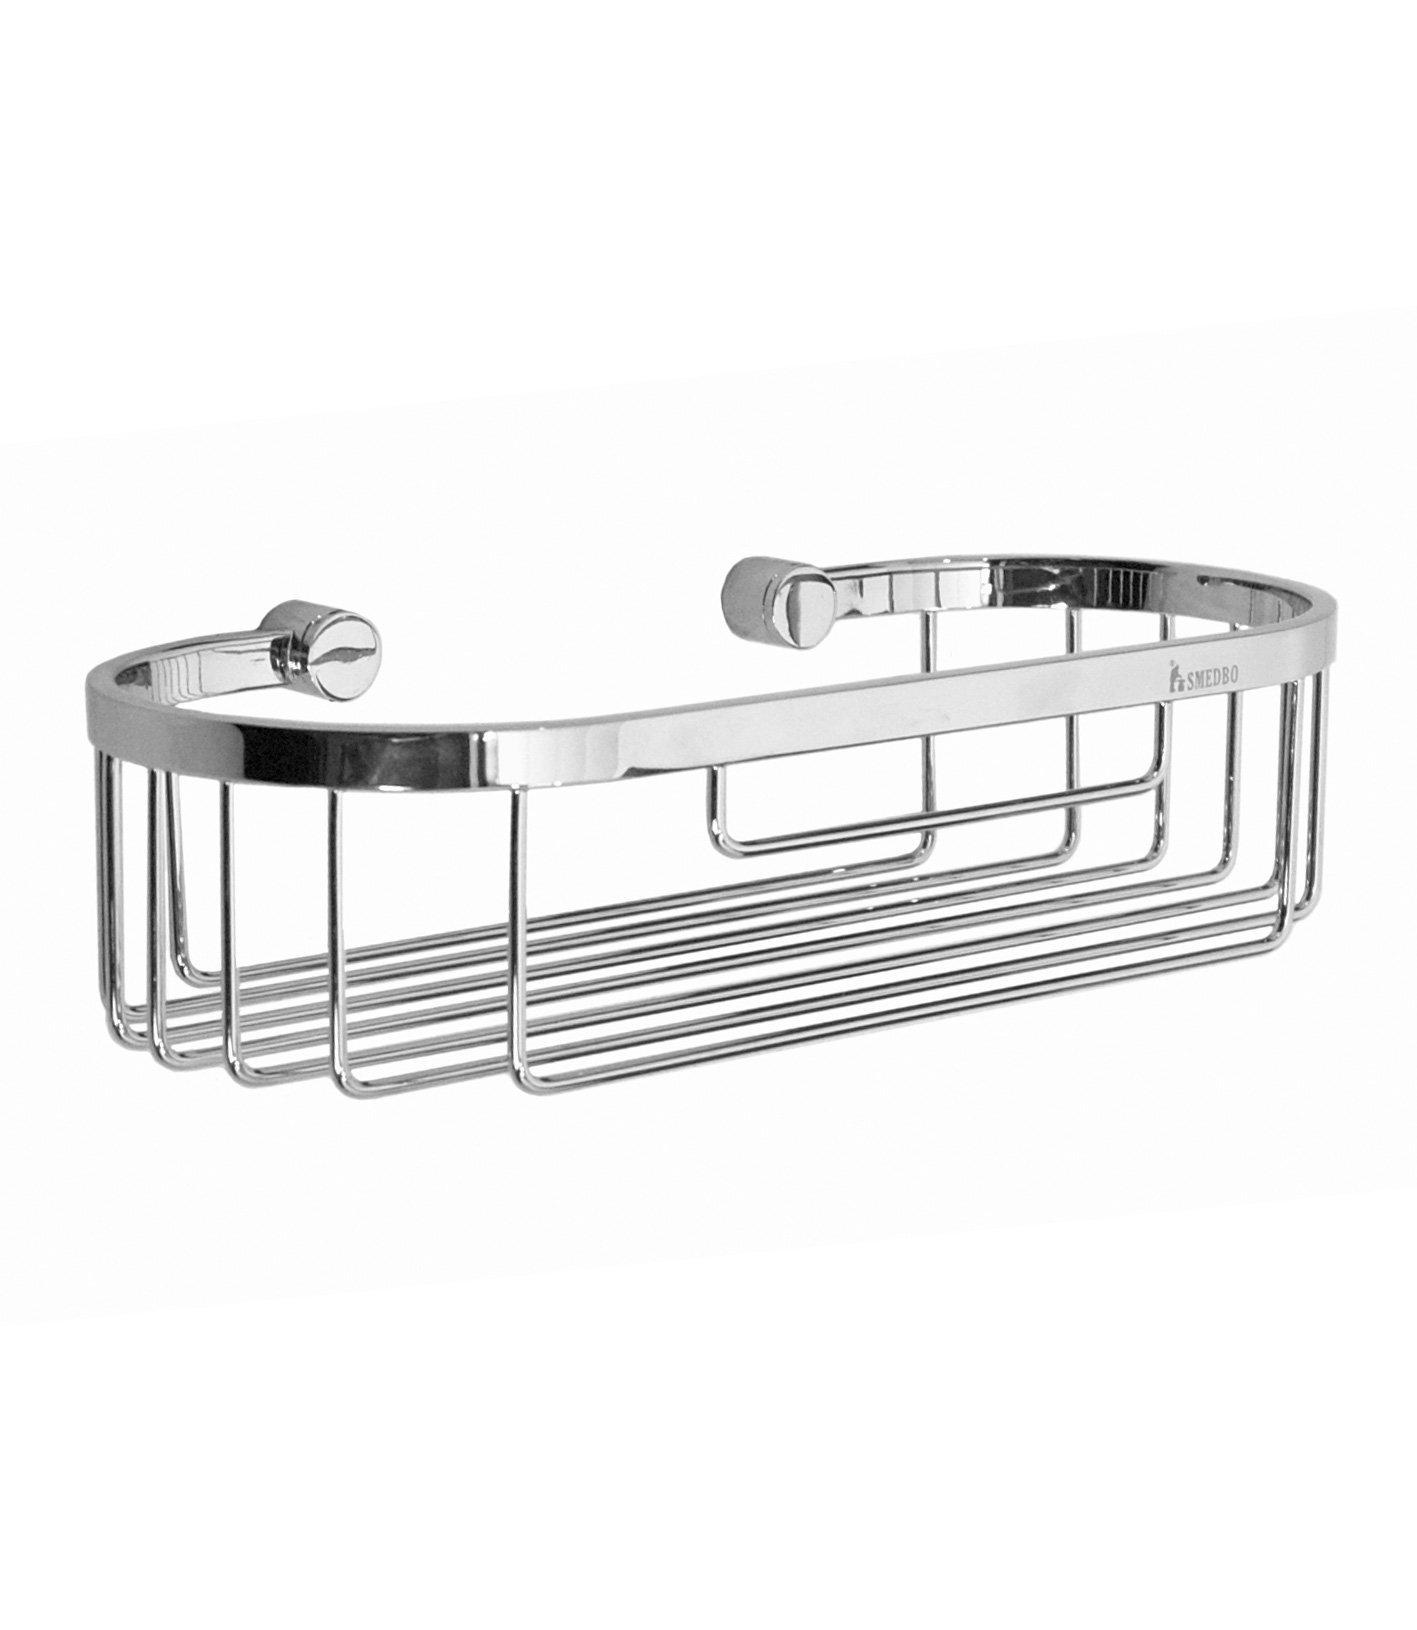 Smedbo SME YK374 Soap Basket Straight 1 Level, Polished Chrome